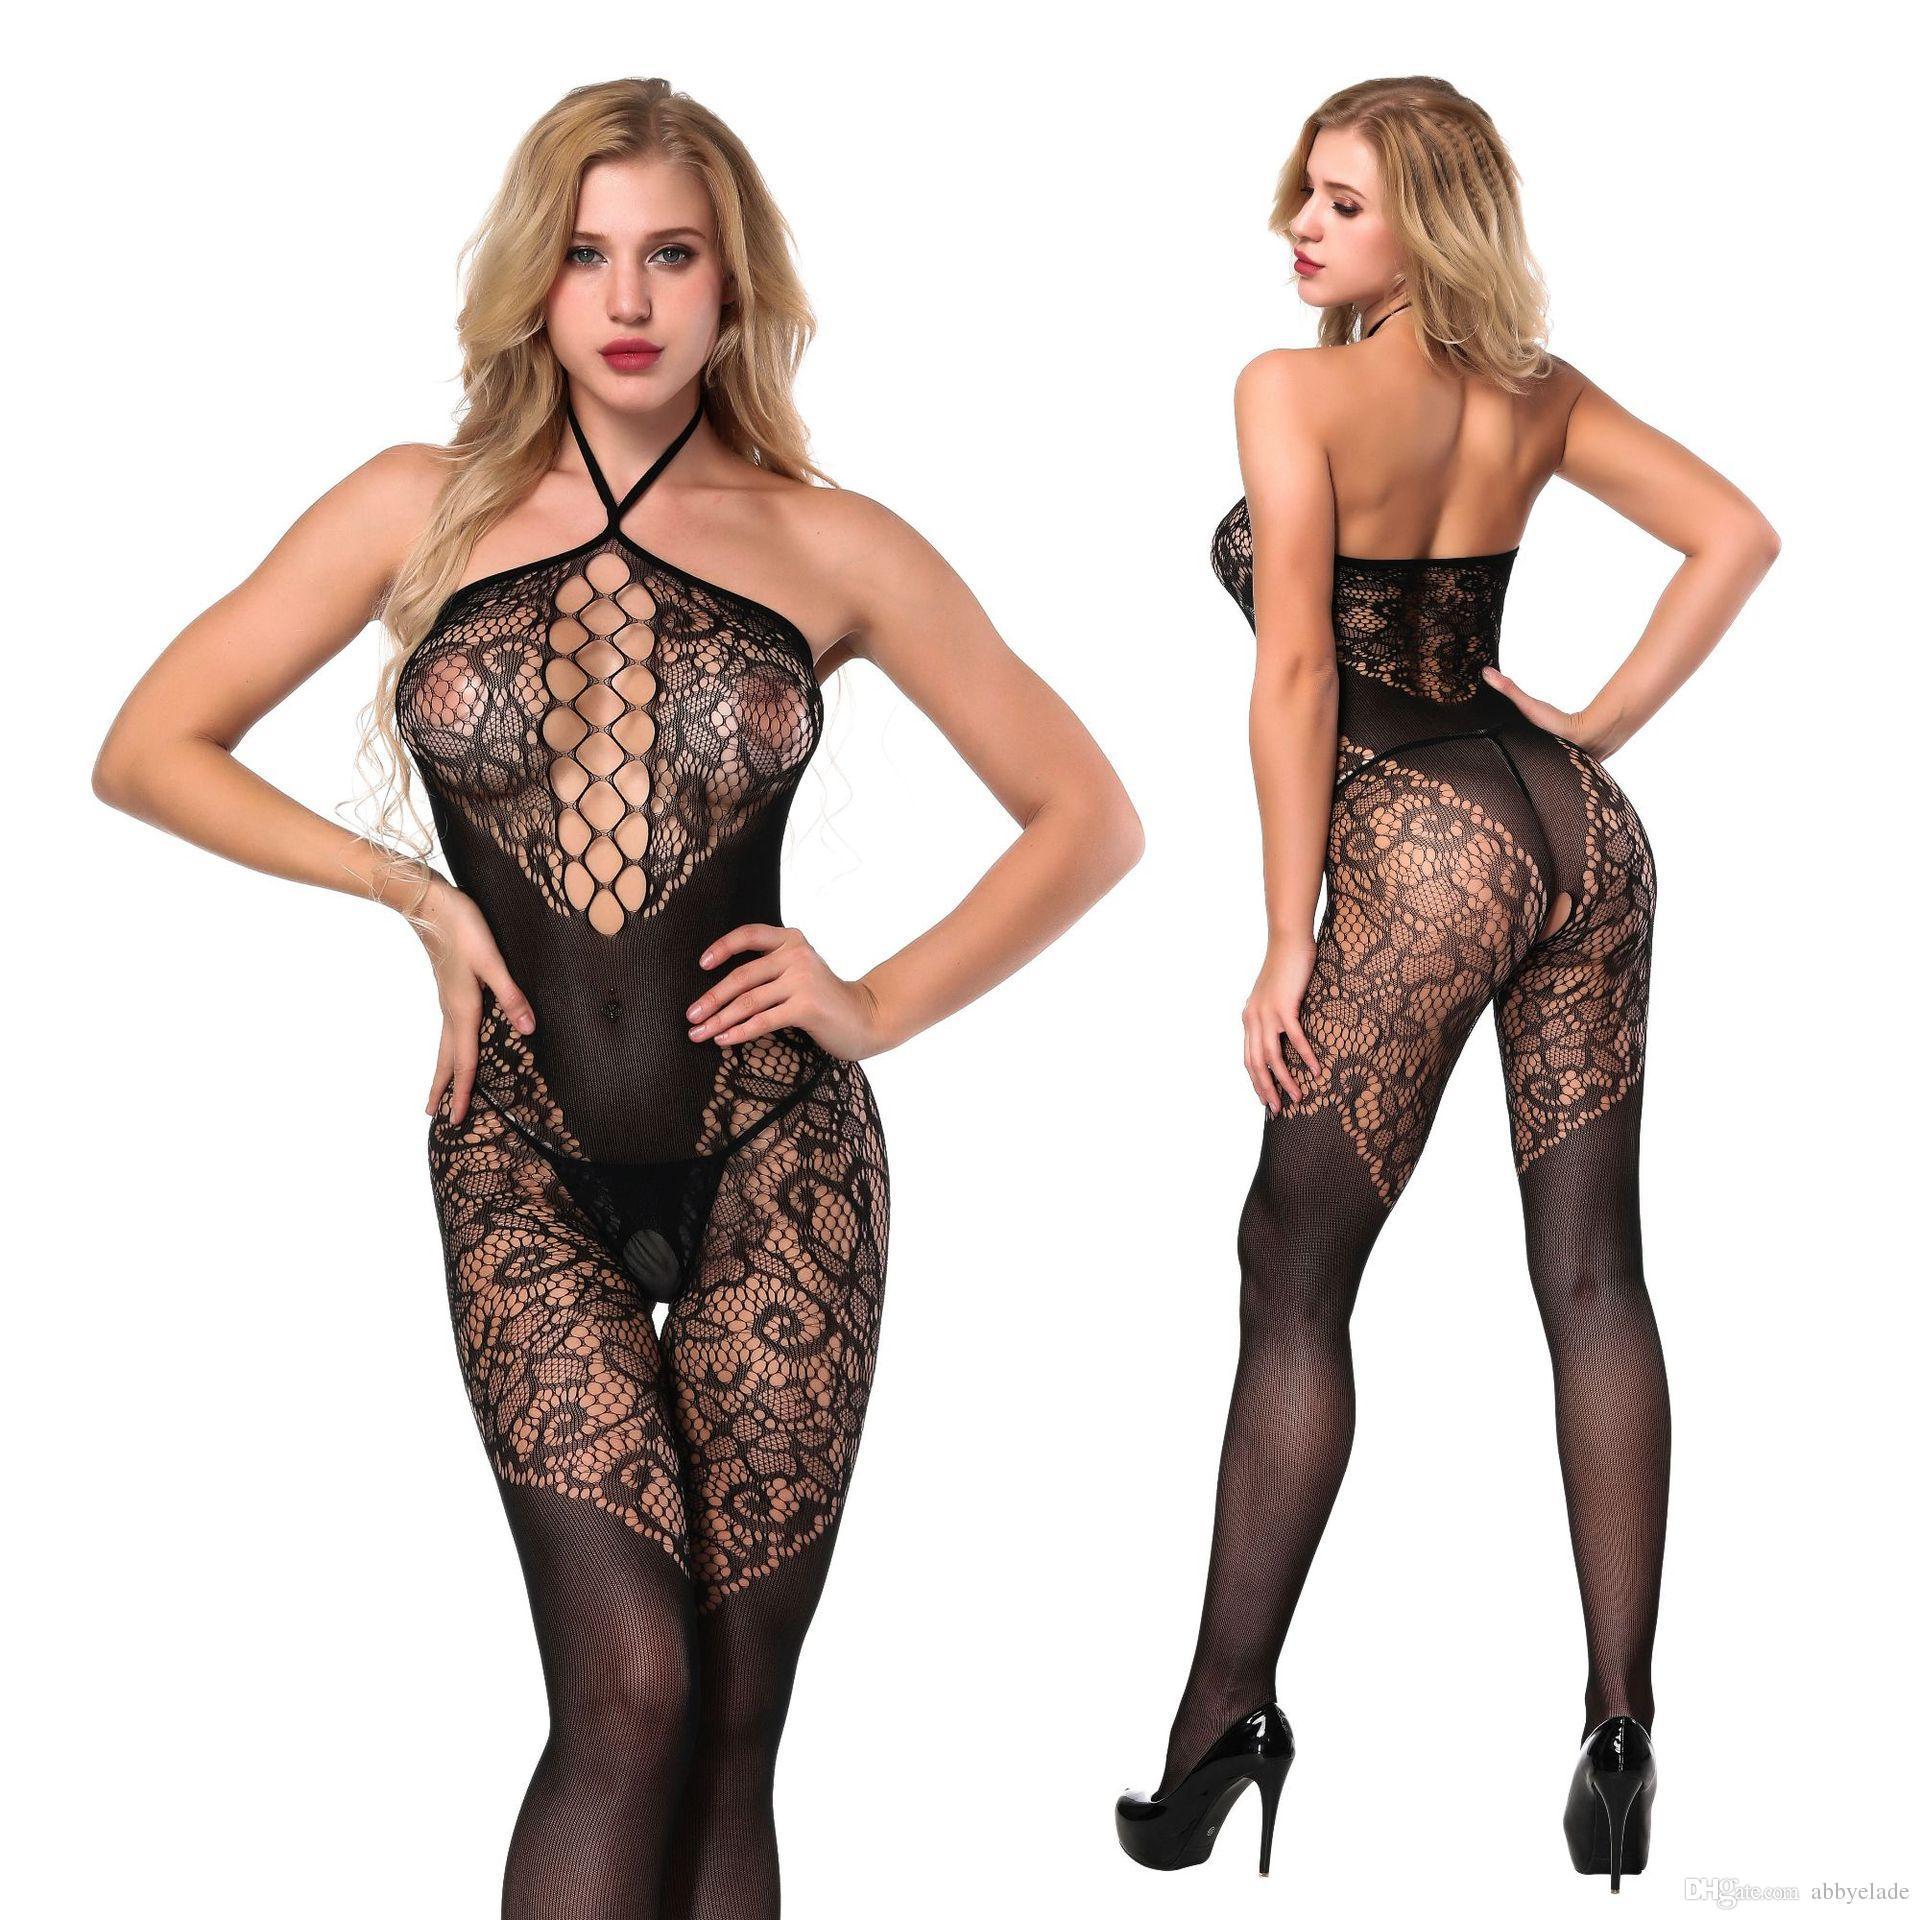 Open Crotch Halter Sexy Bodystockings Nightwear Hot Lingerie Pajamas Women's Intimates Fishnet Crotchless Bodysuit Teddies Bodywewar